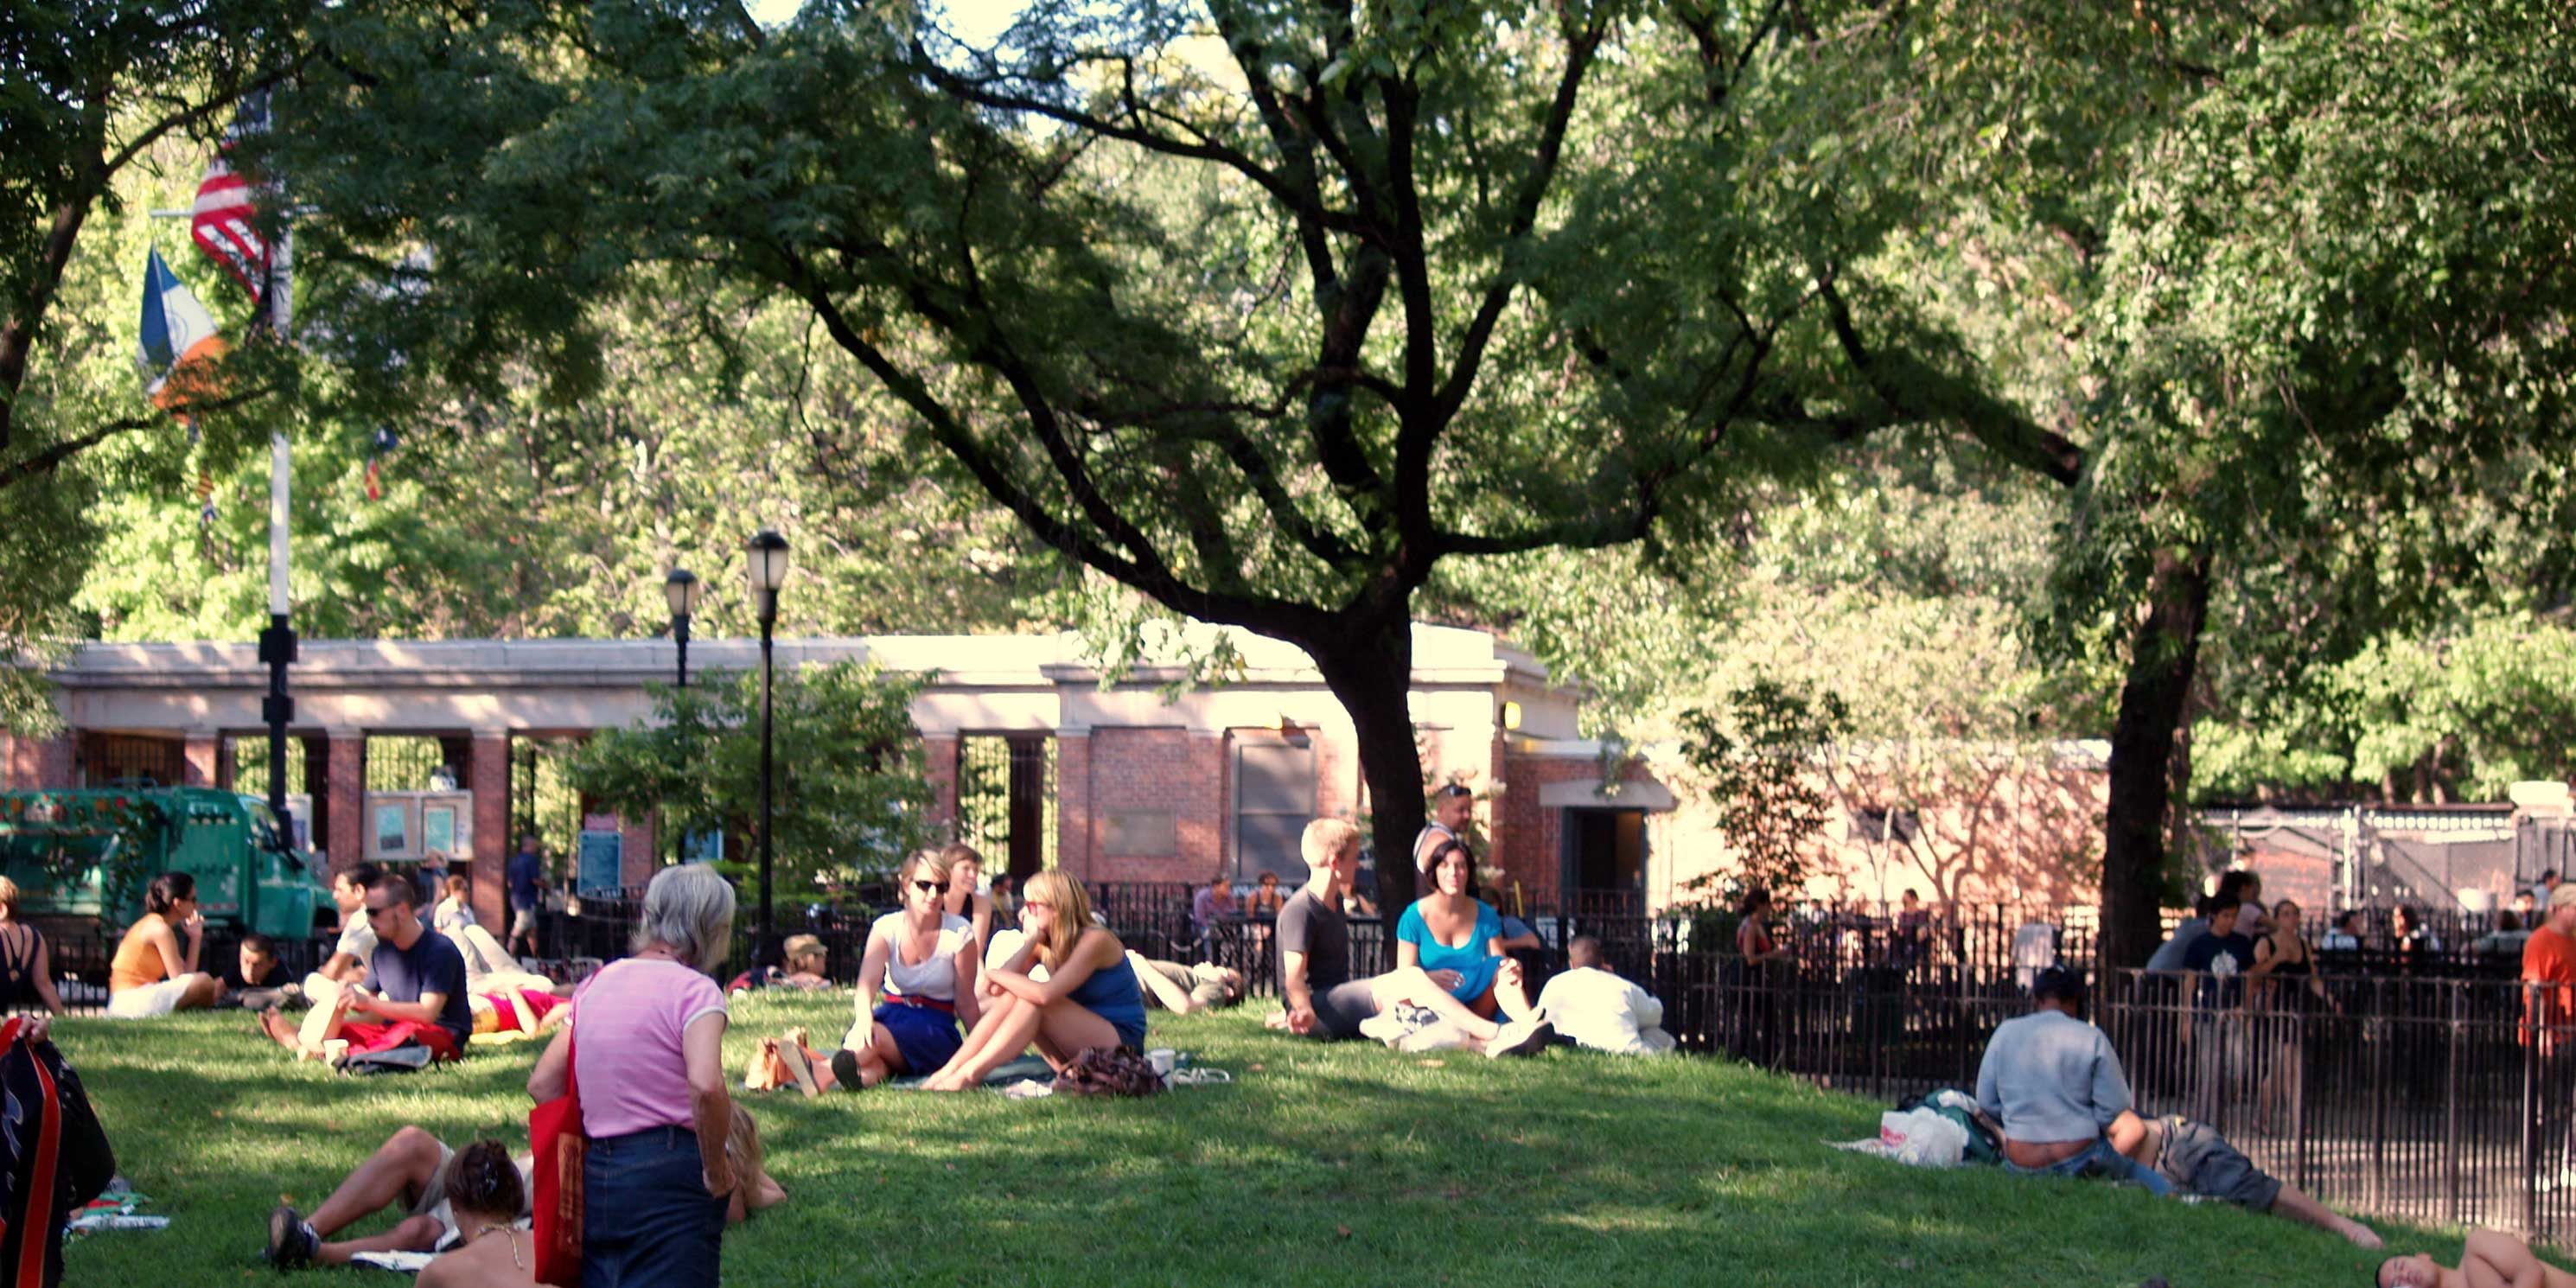 sunbathers in Tompkins Square Park